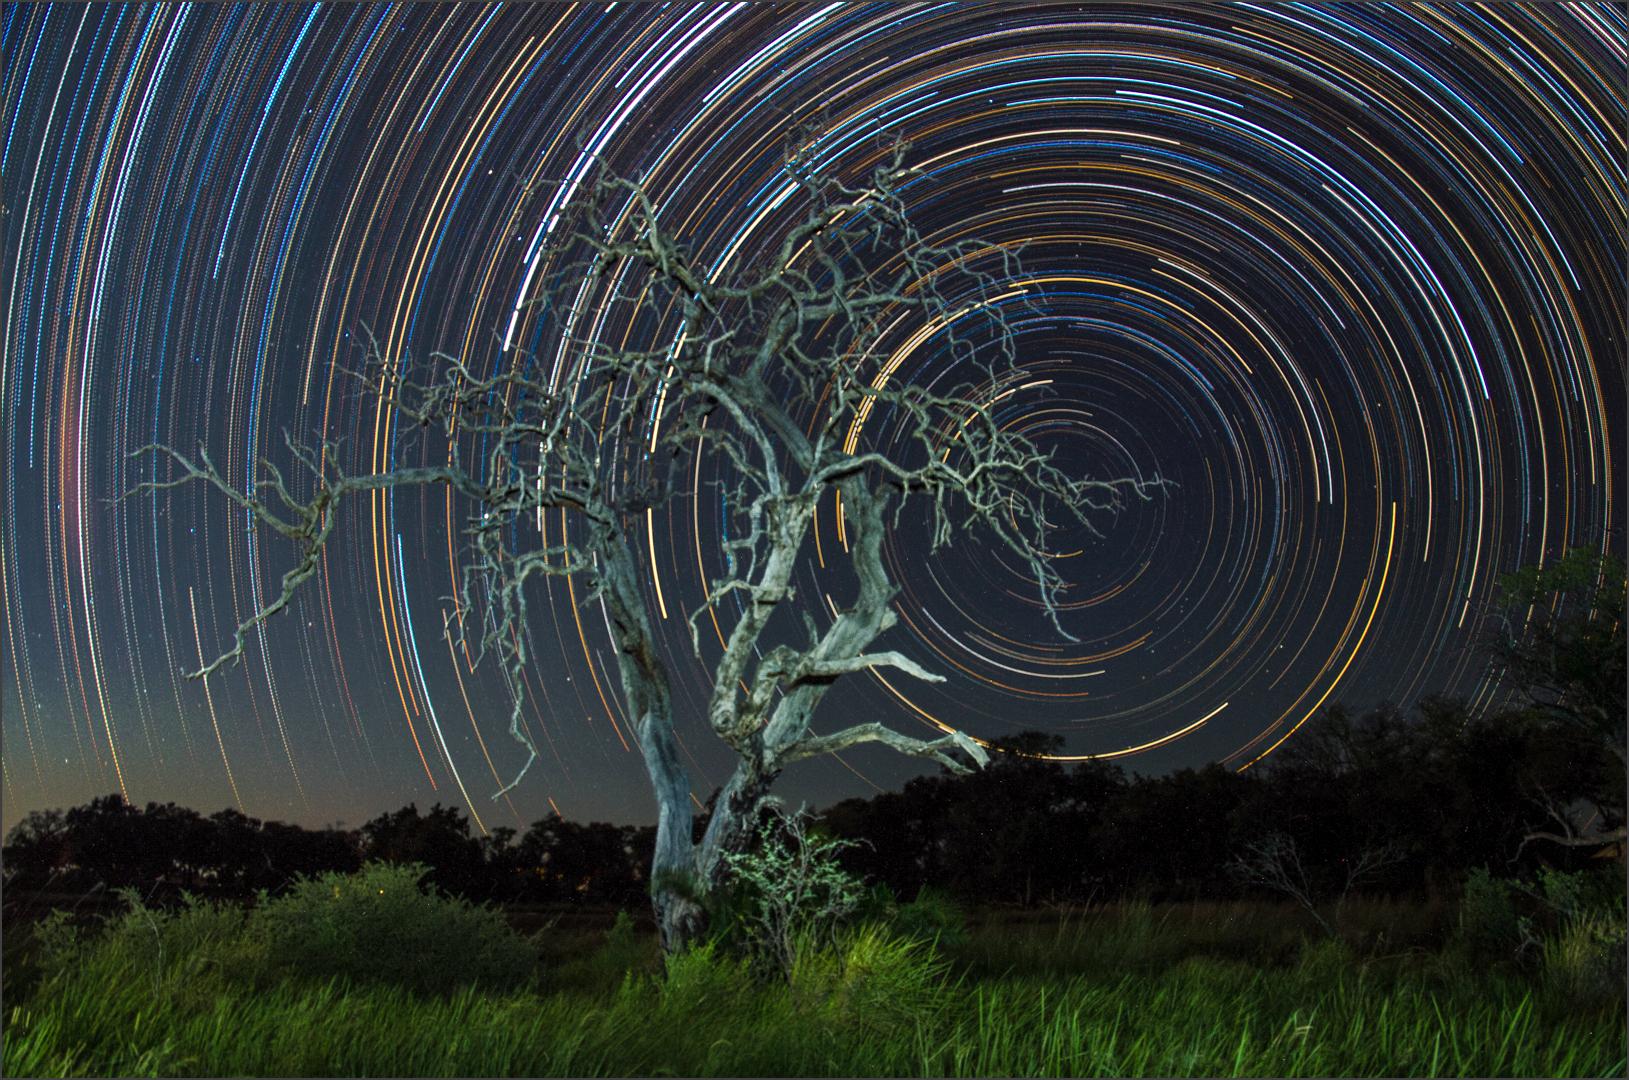 Rickus Barnard - The World Behind The Tree - COM, Best of Theme